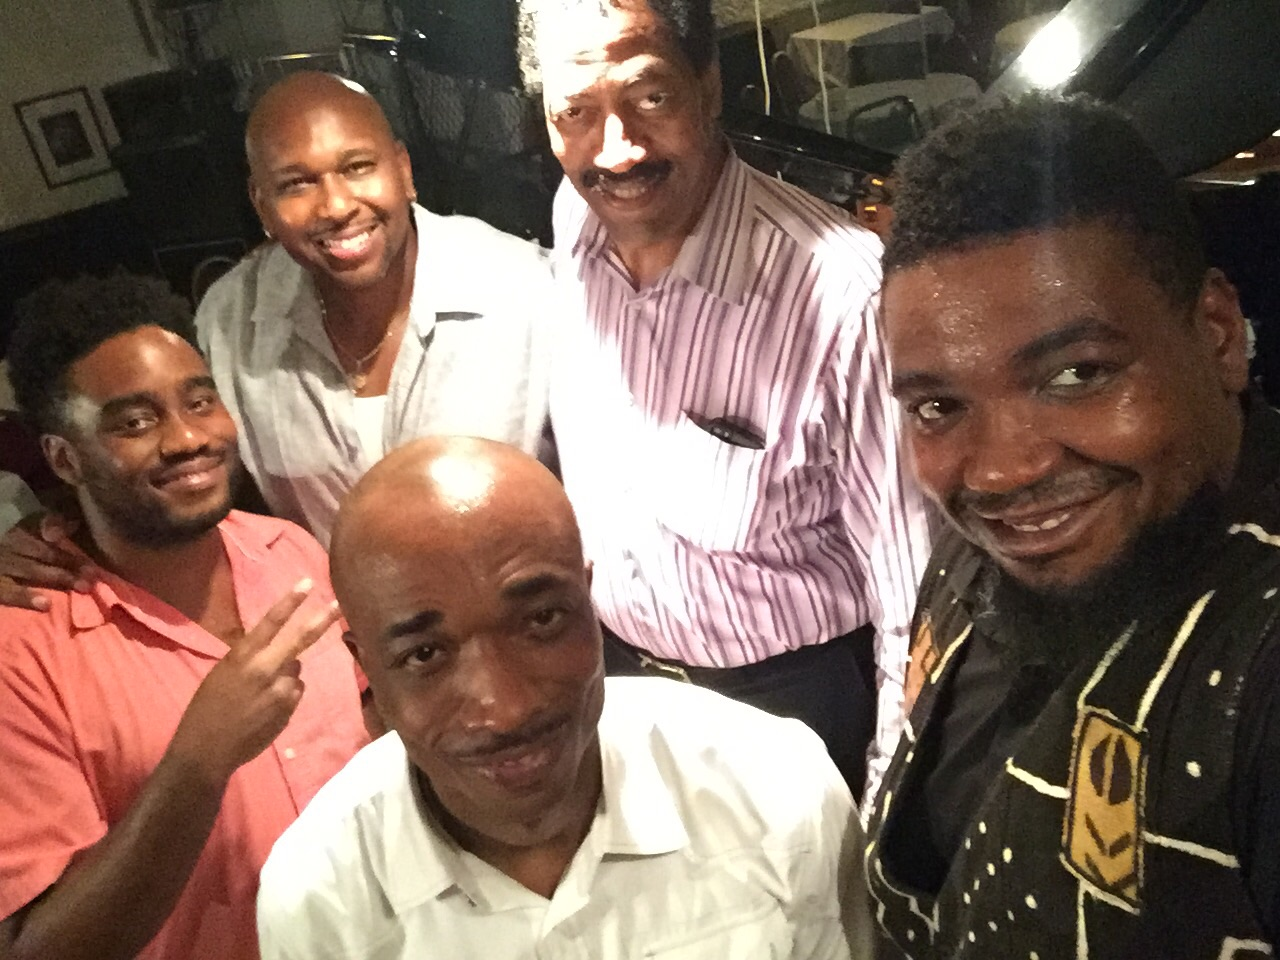 Kenneth Cobb (2nd from R) with (L-R) David Bryant, Abraham Burton, Eric McPherson, Dezron Douglas